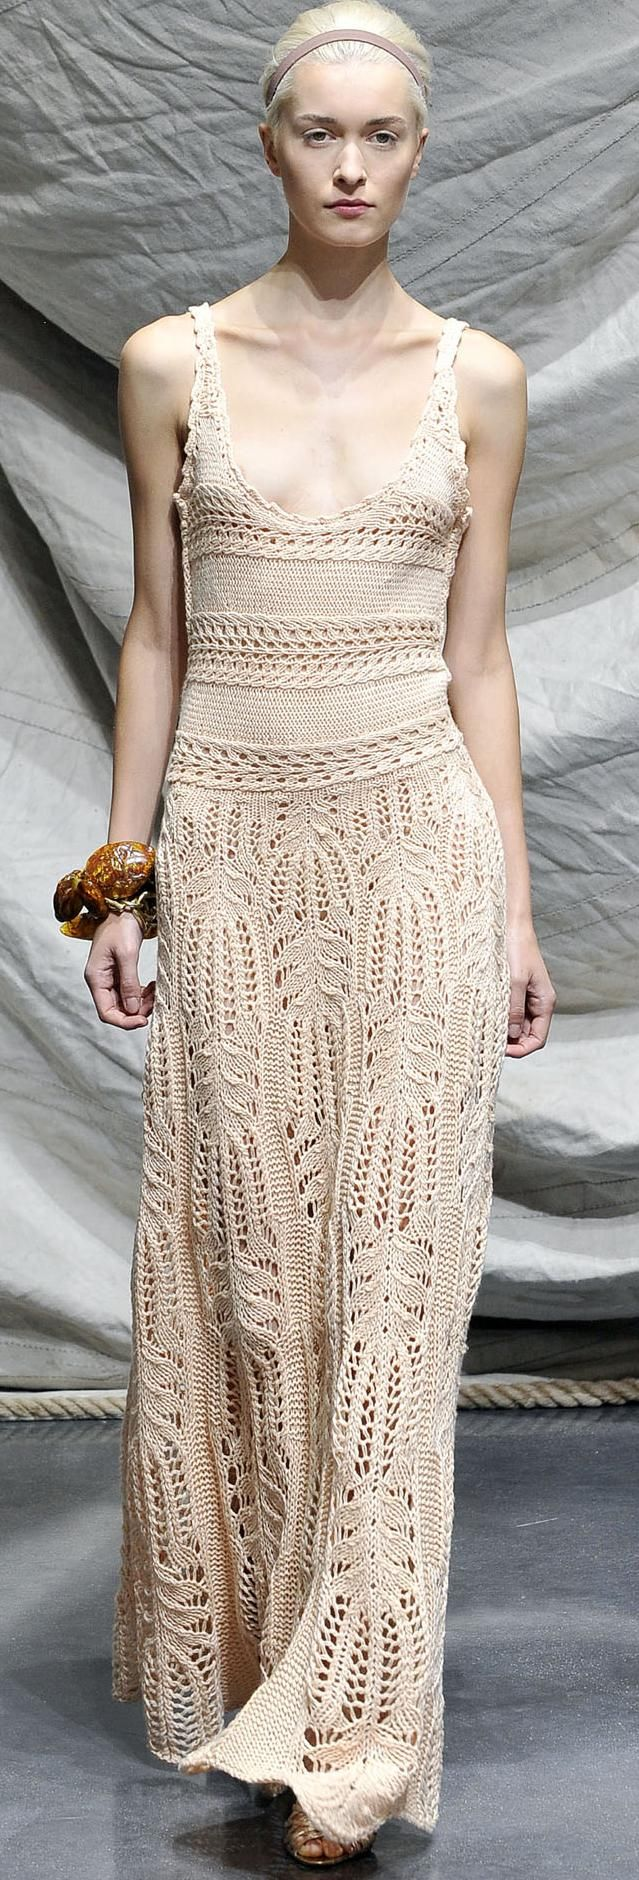 Graeme Black knitted dress